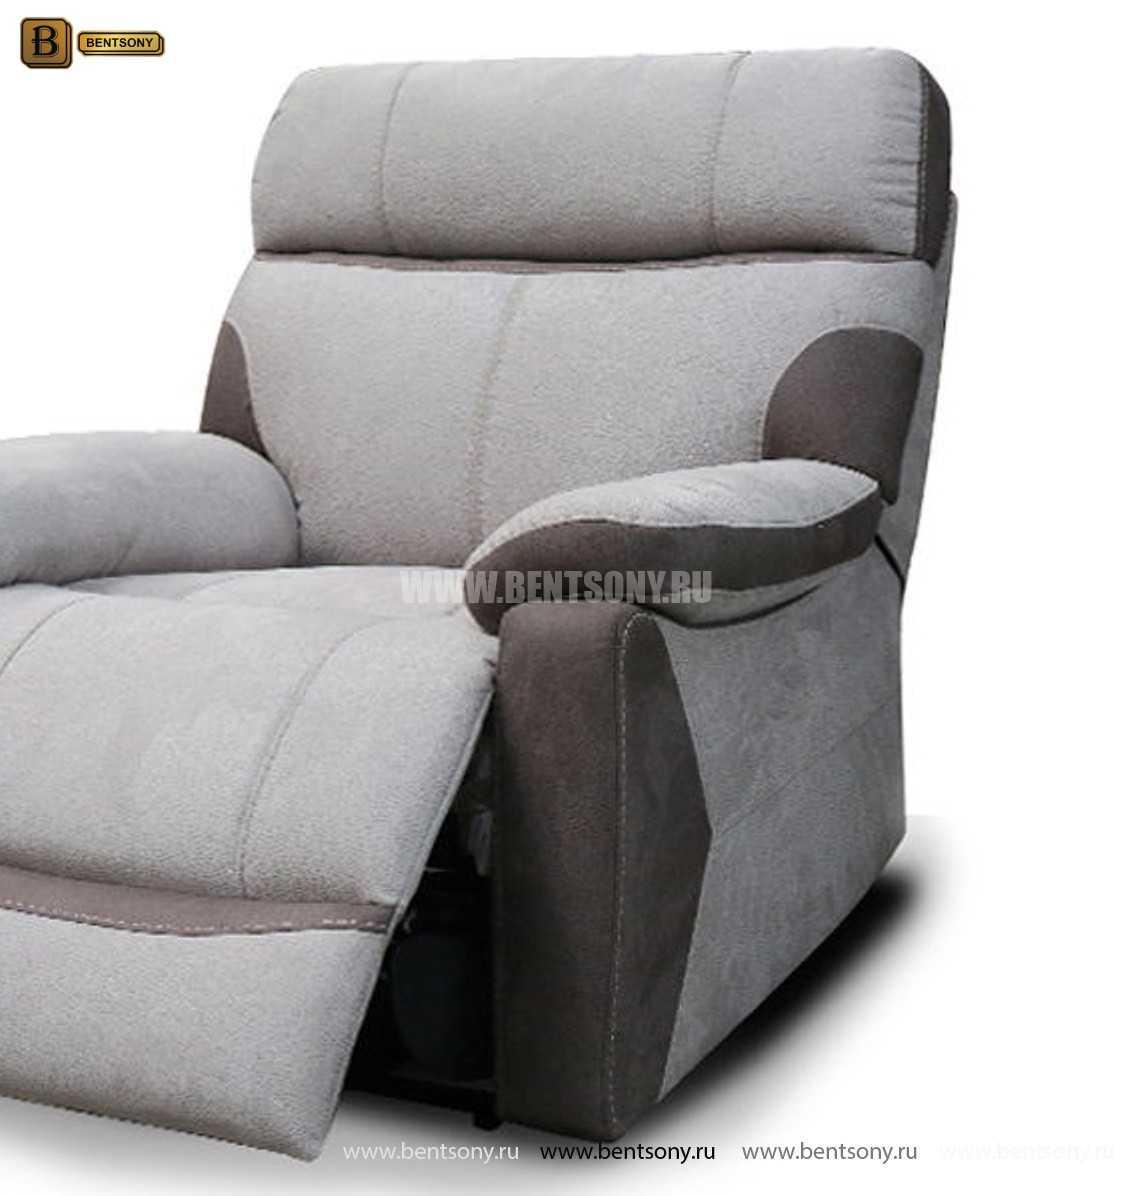 Кресло Моретон (Реклайнер, Алькантара) цена